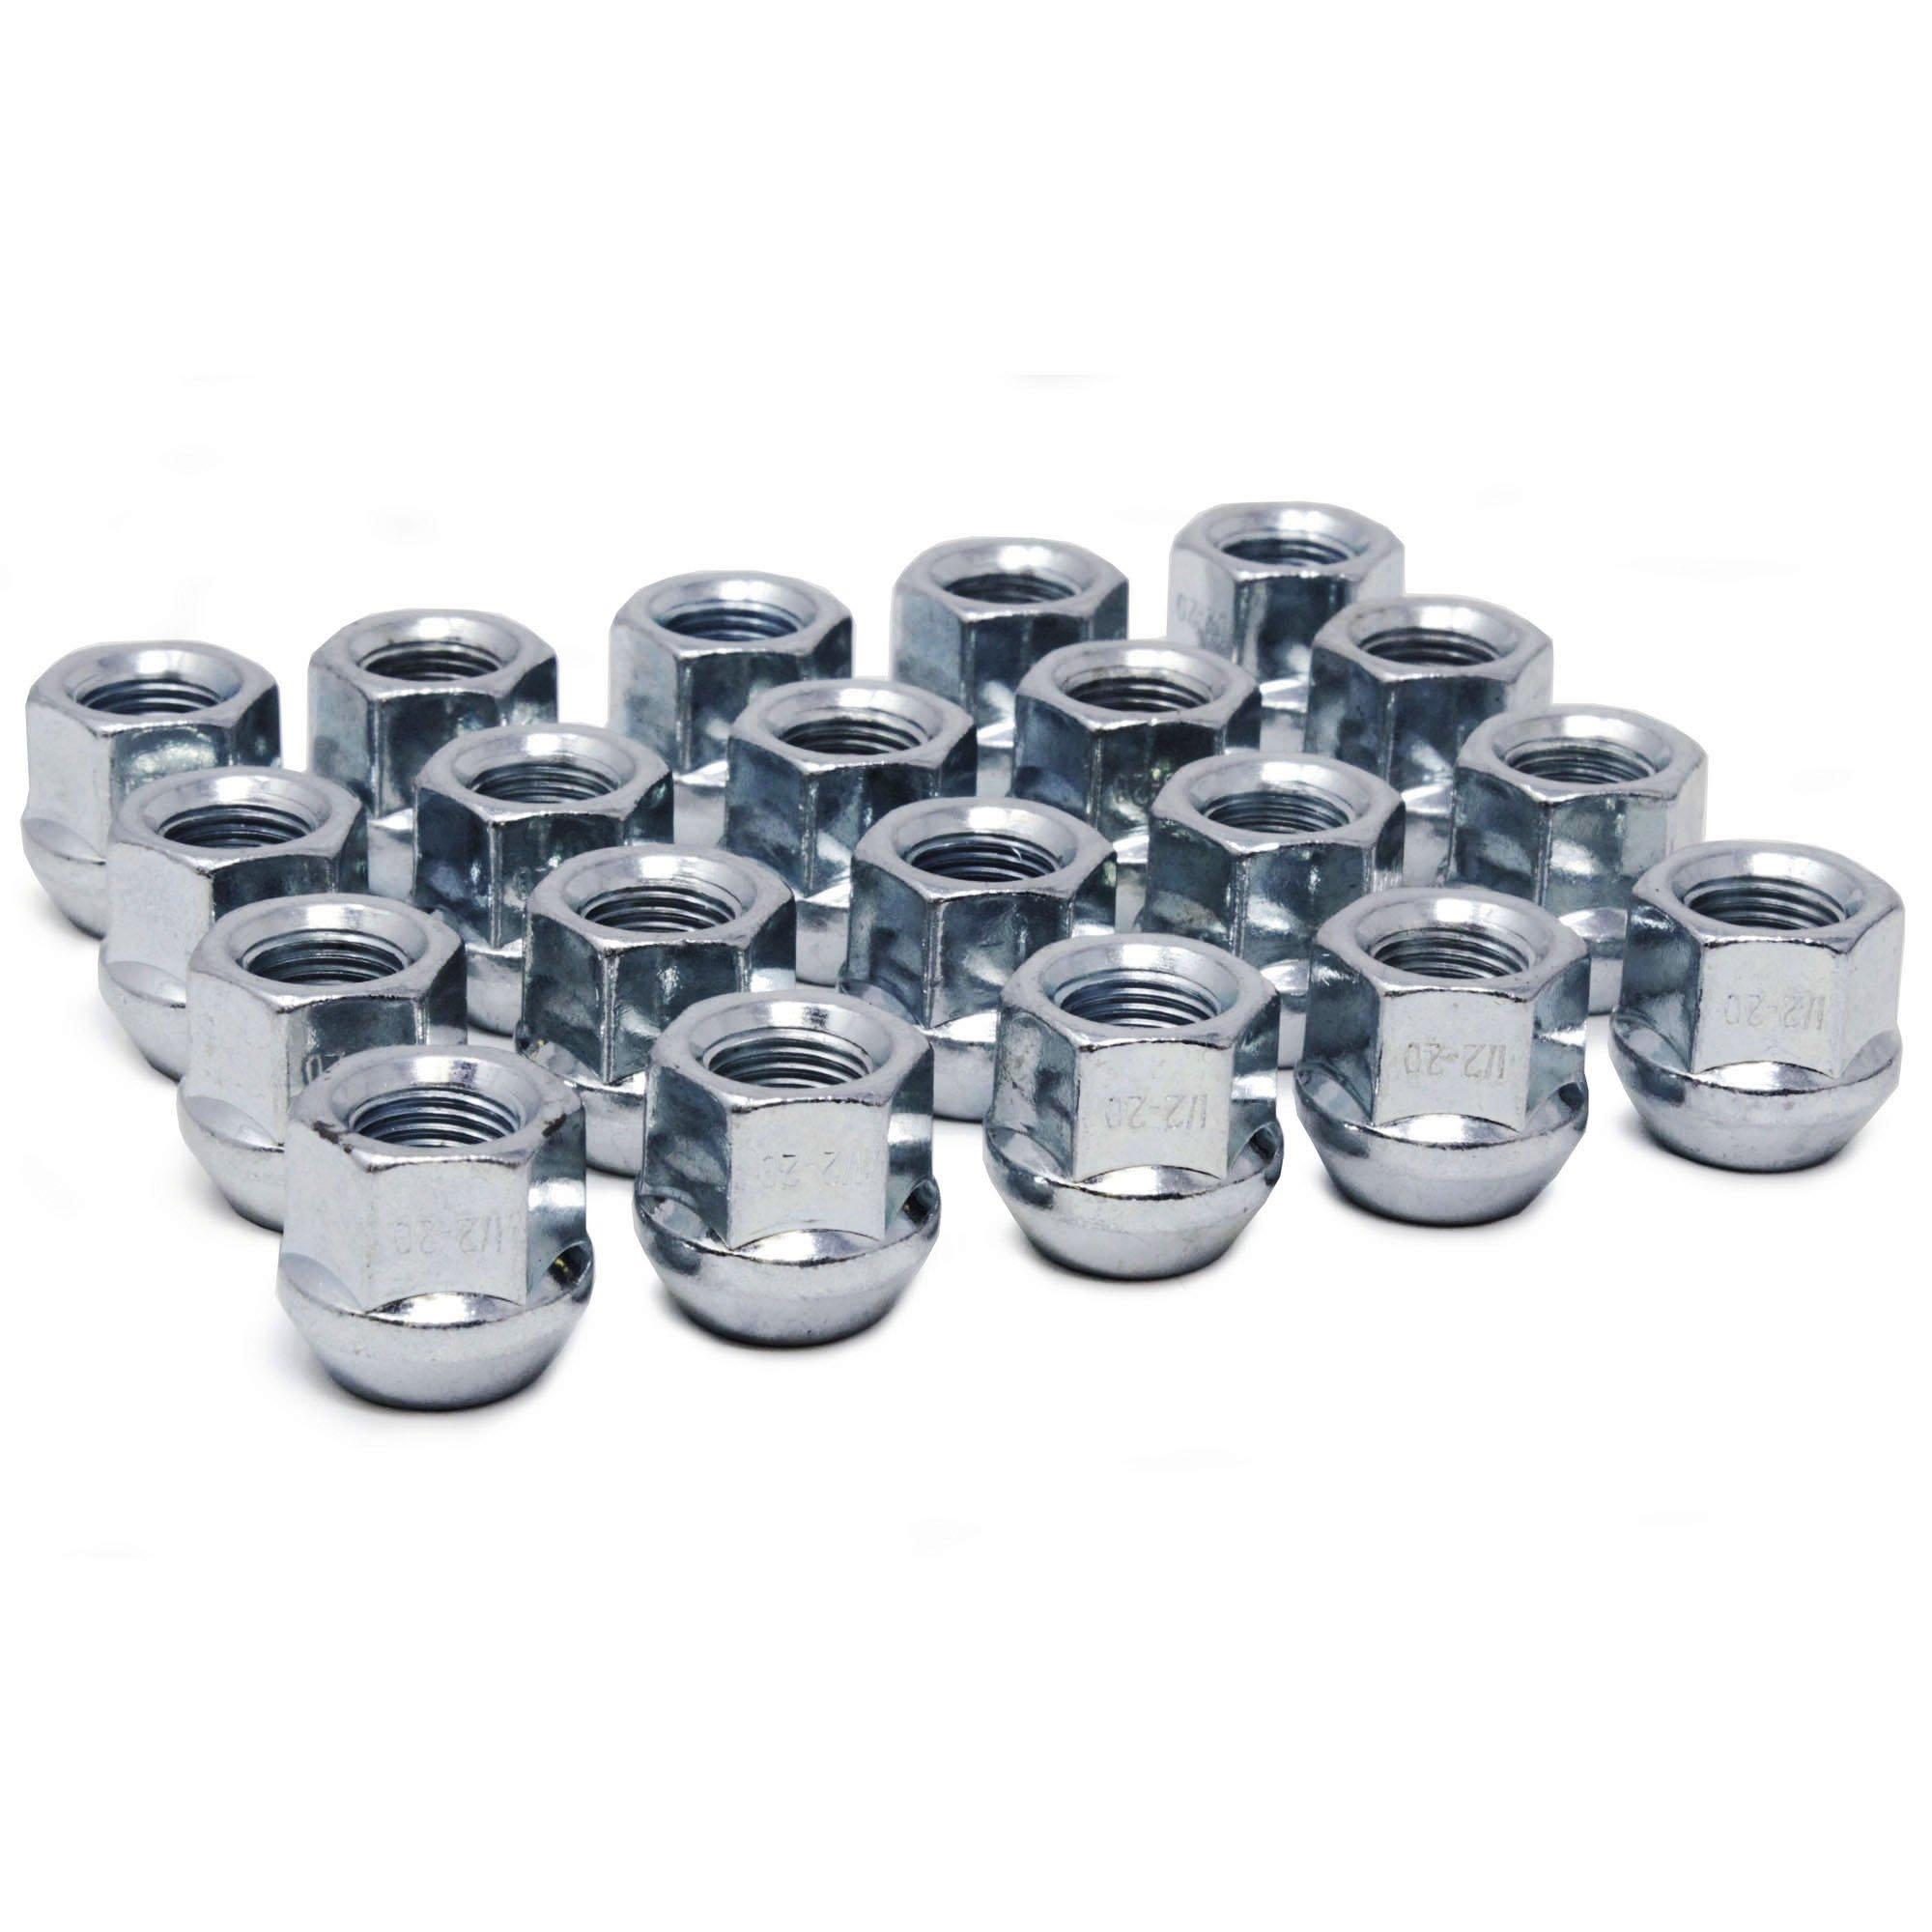 WheelGuard 1104, Zinc Finish, Open-end Acorn Bulge Lug Nut, 1/2-20 Thread, 3/4 Hex, (Pack of 20)